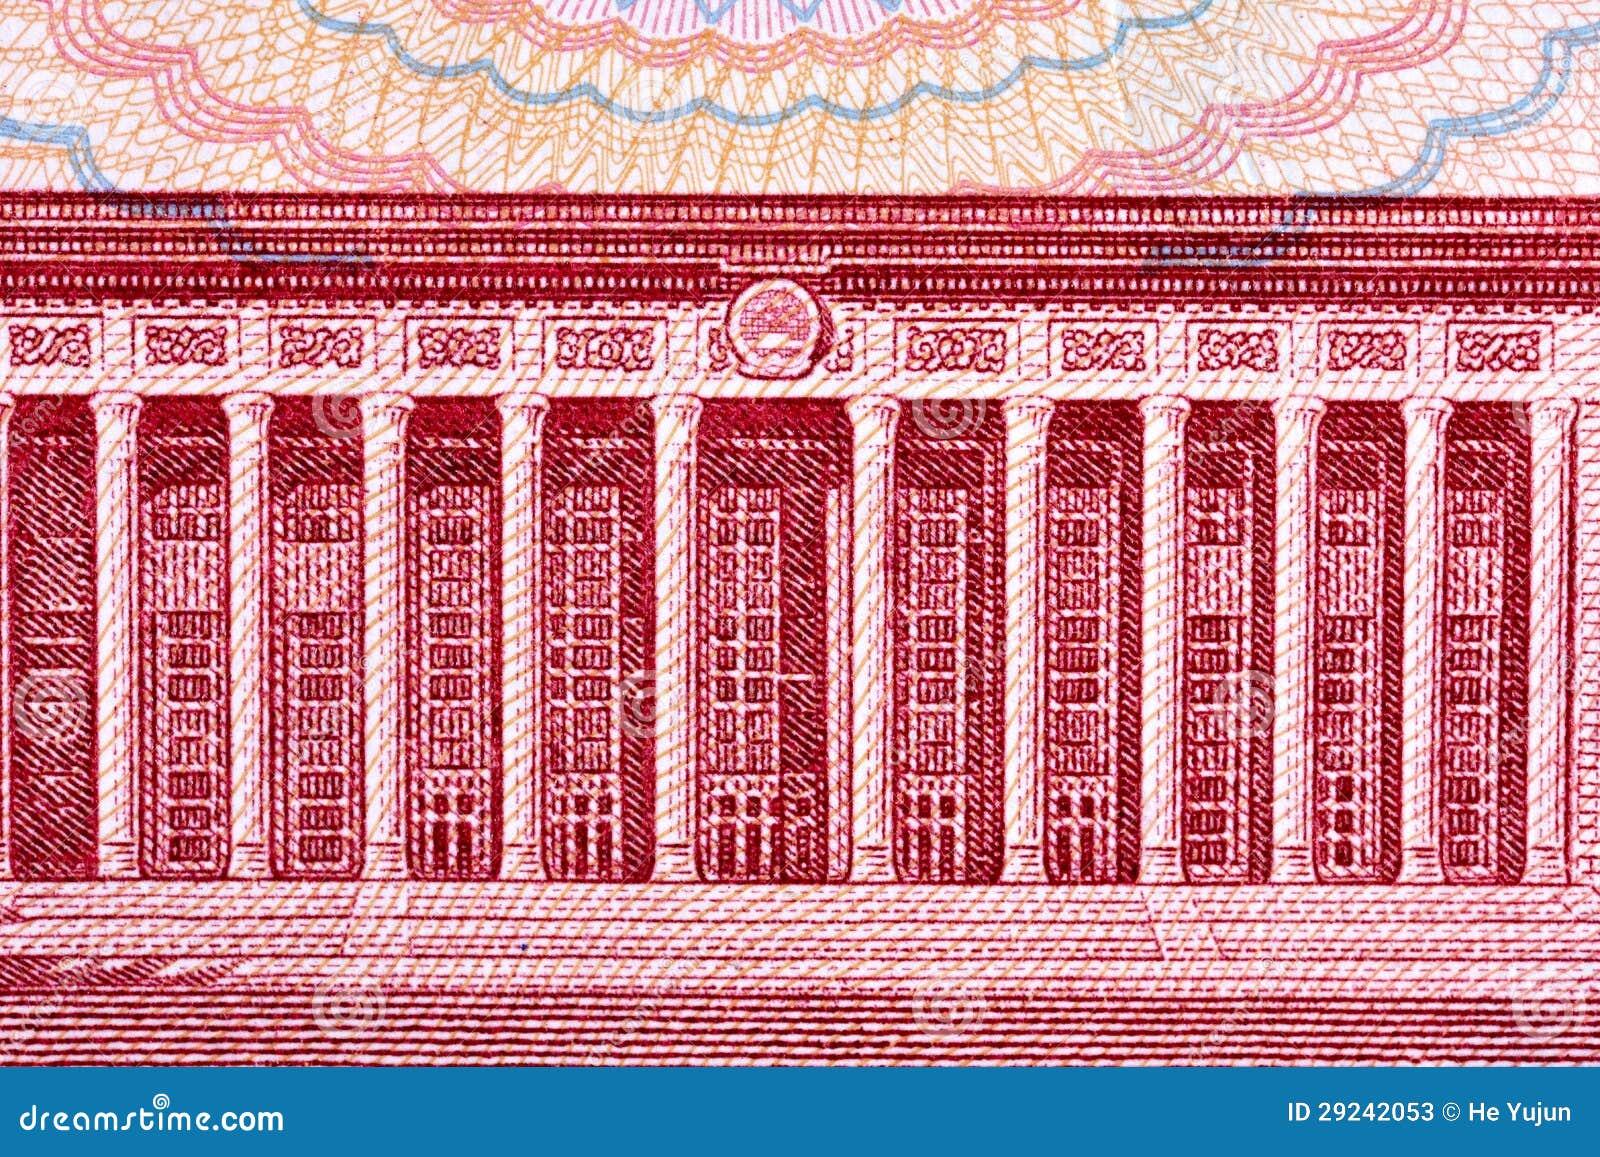 Download Moeda chinesa: Renminbi imagem de stock. Imagem de crédito - 29242053